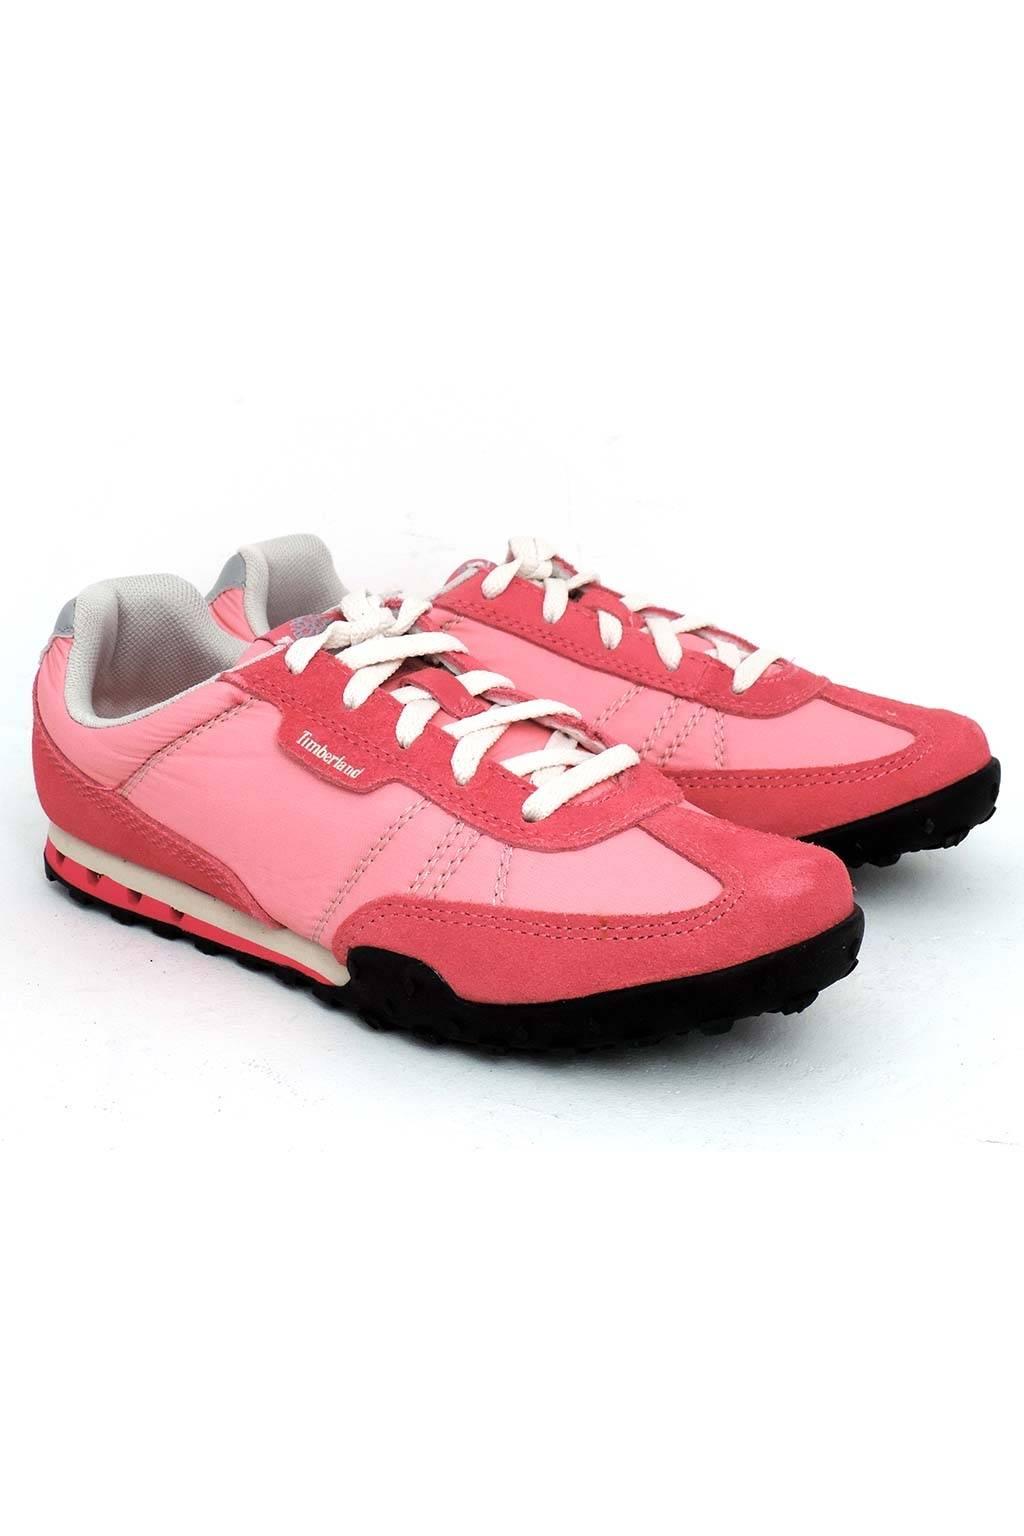 Timberland 5709A Pink